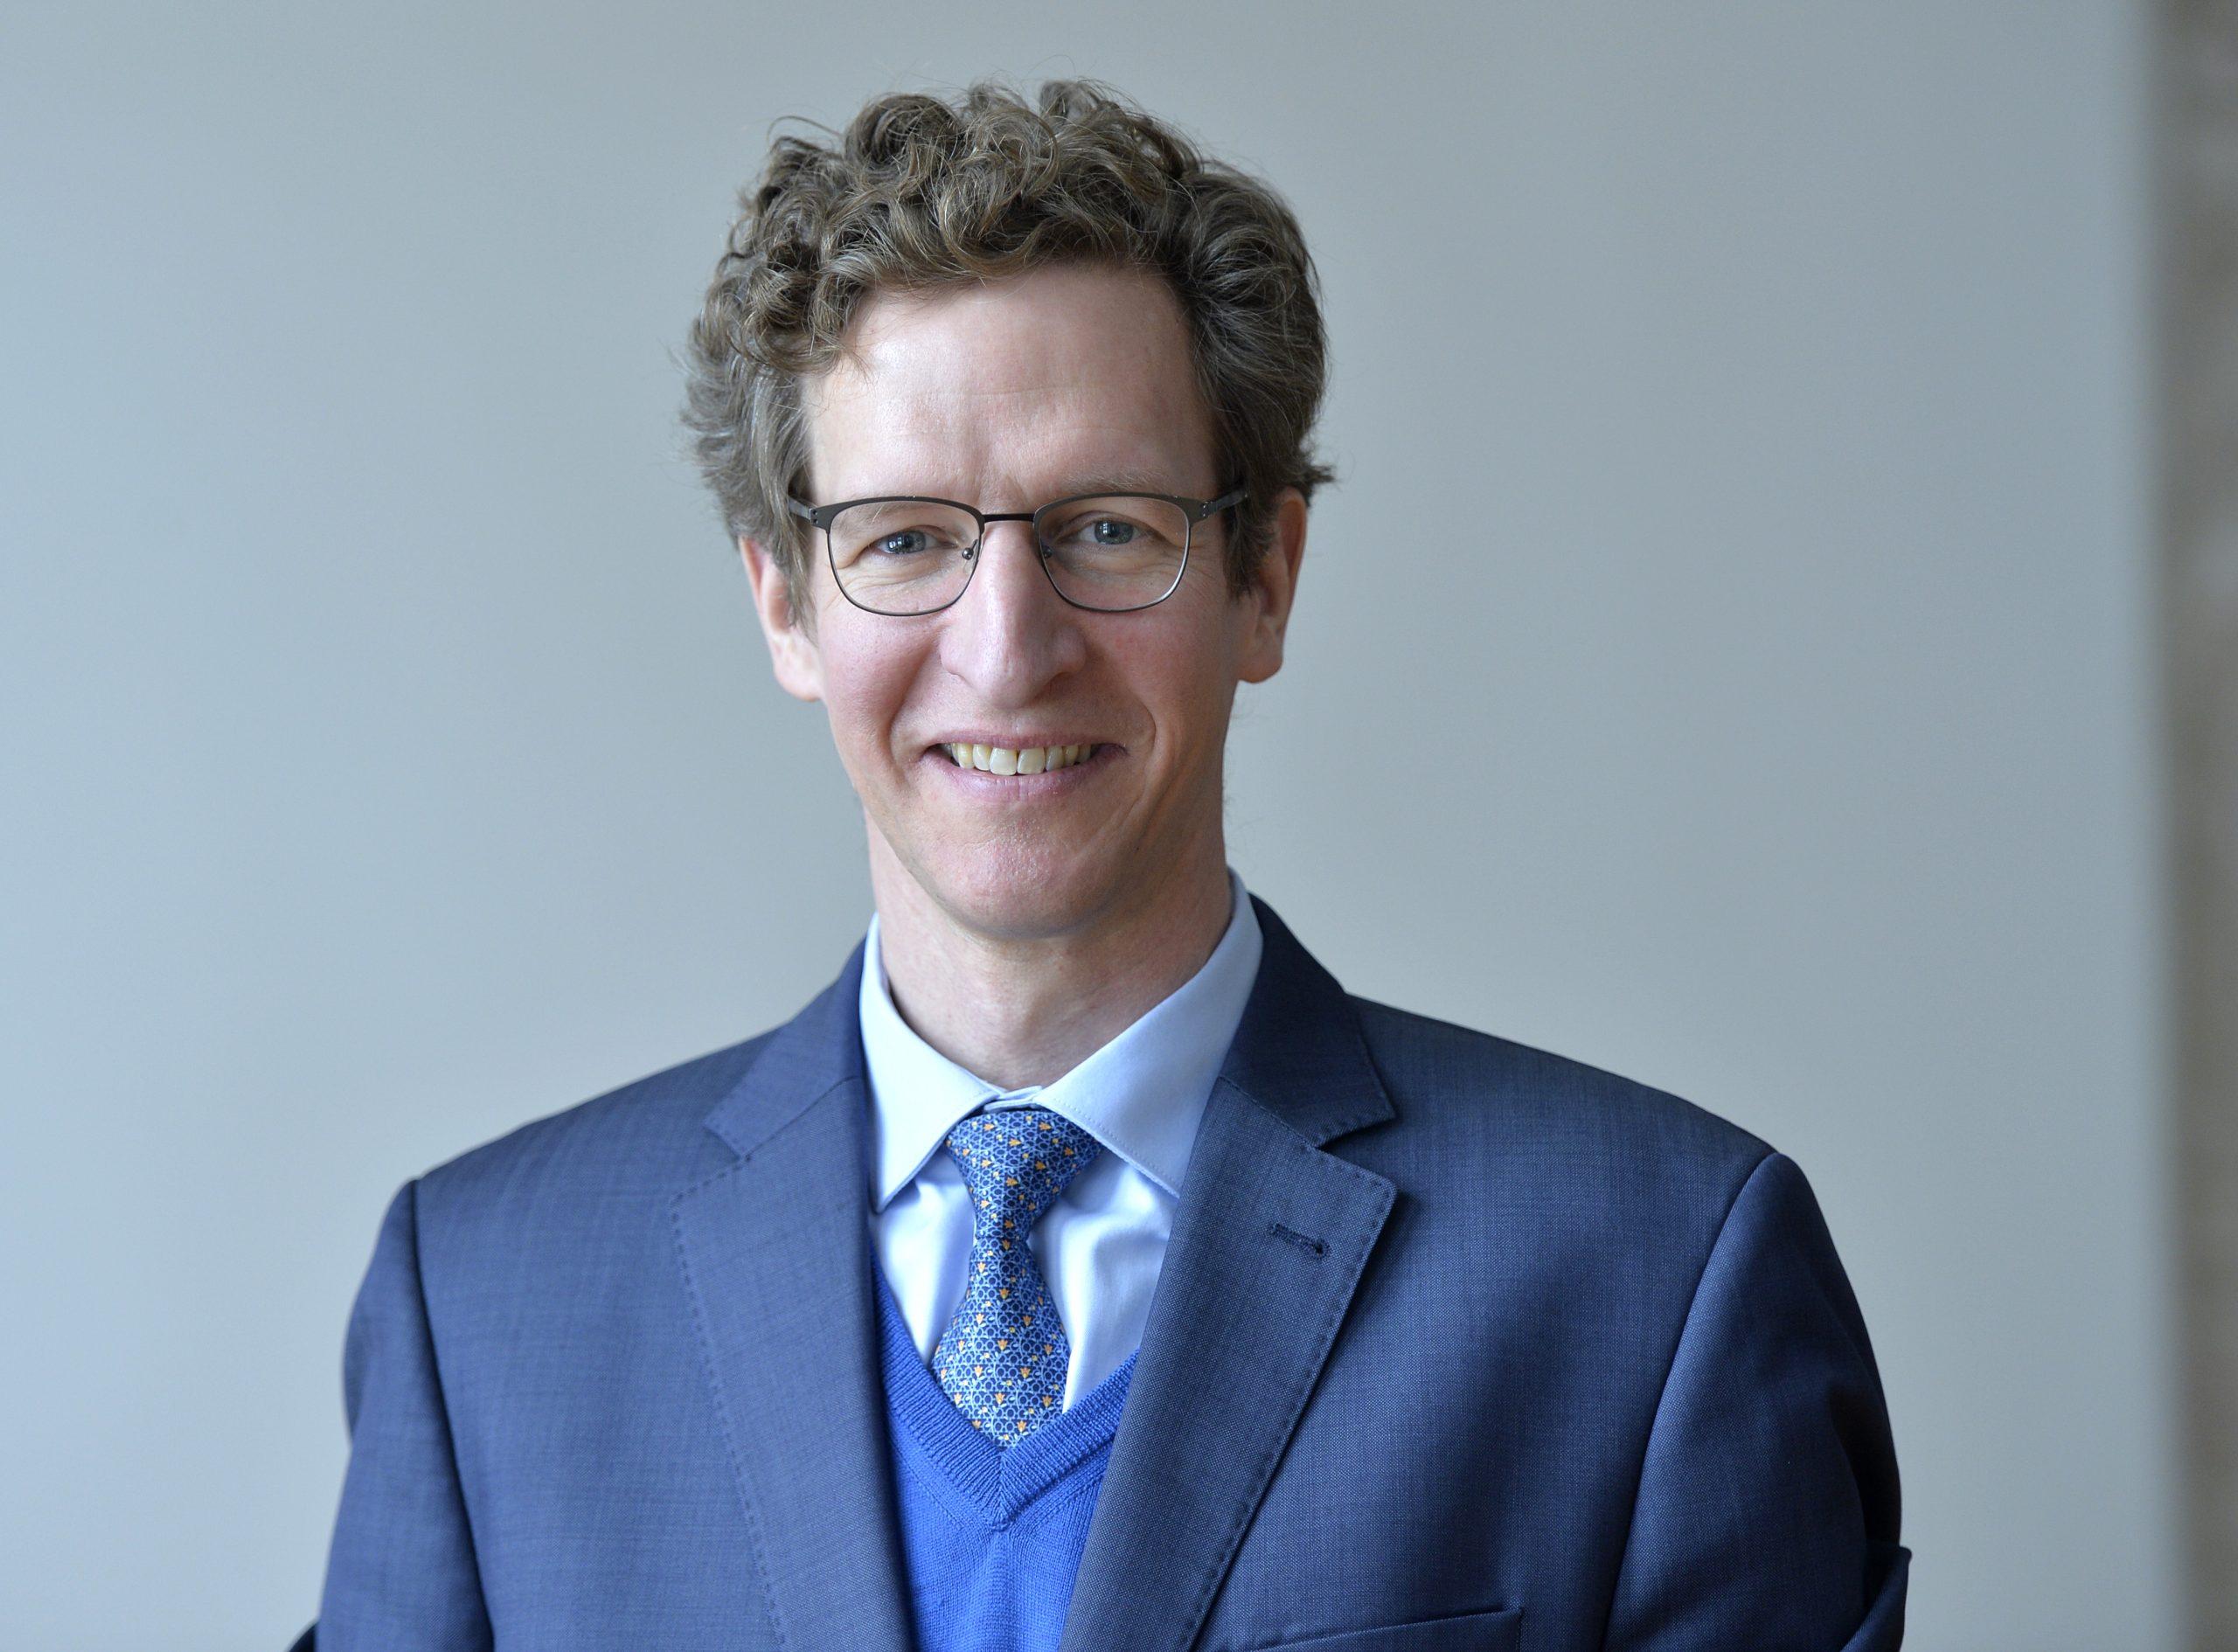 Prof. Dr. Peter Hommelhoff